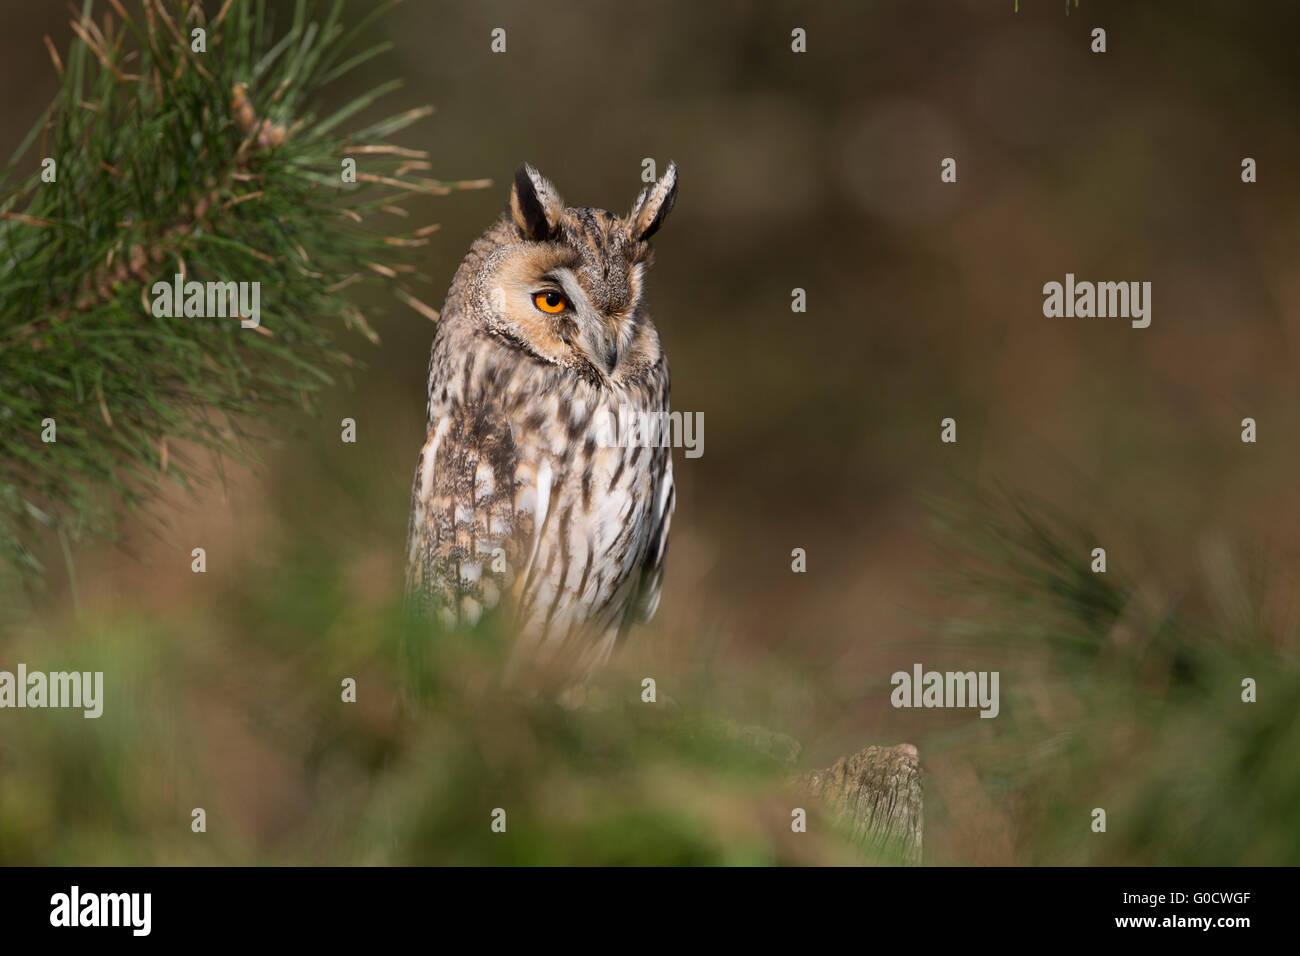 Búho de orejas largas; asio otus solo en Pino Cornwall; UK Imagen De Stock